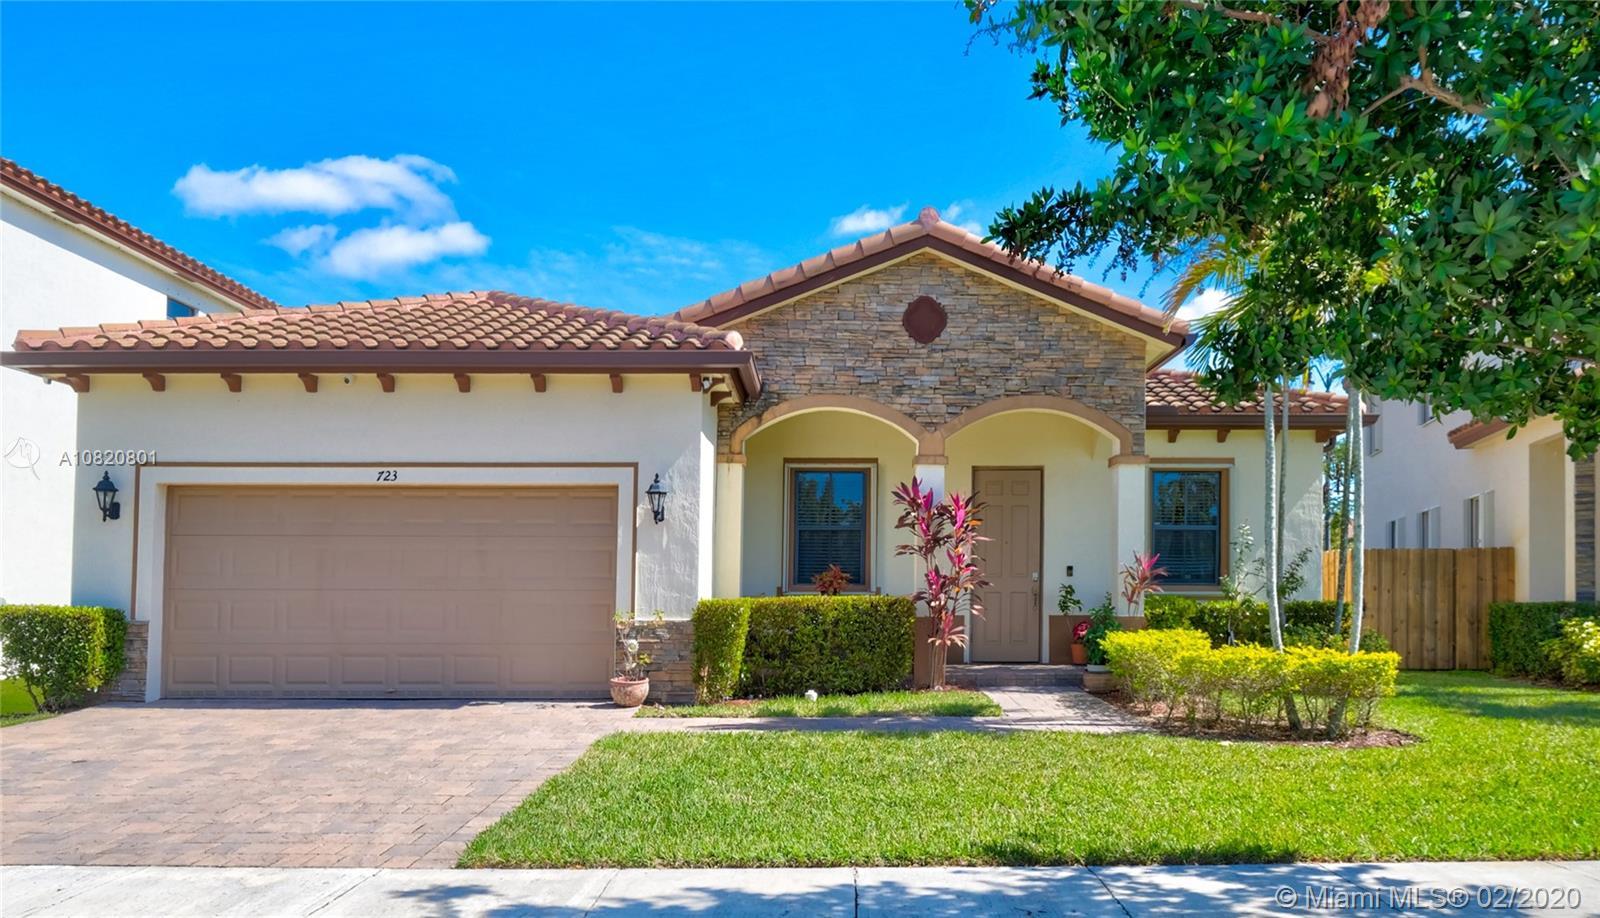 723 SE 35th Ter, Homestead, FL 33033 - Homestead, FL real estate listing